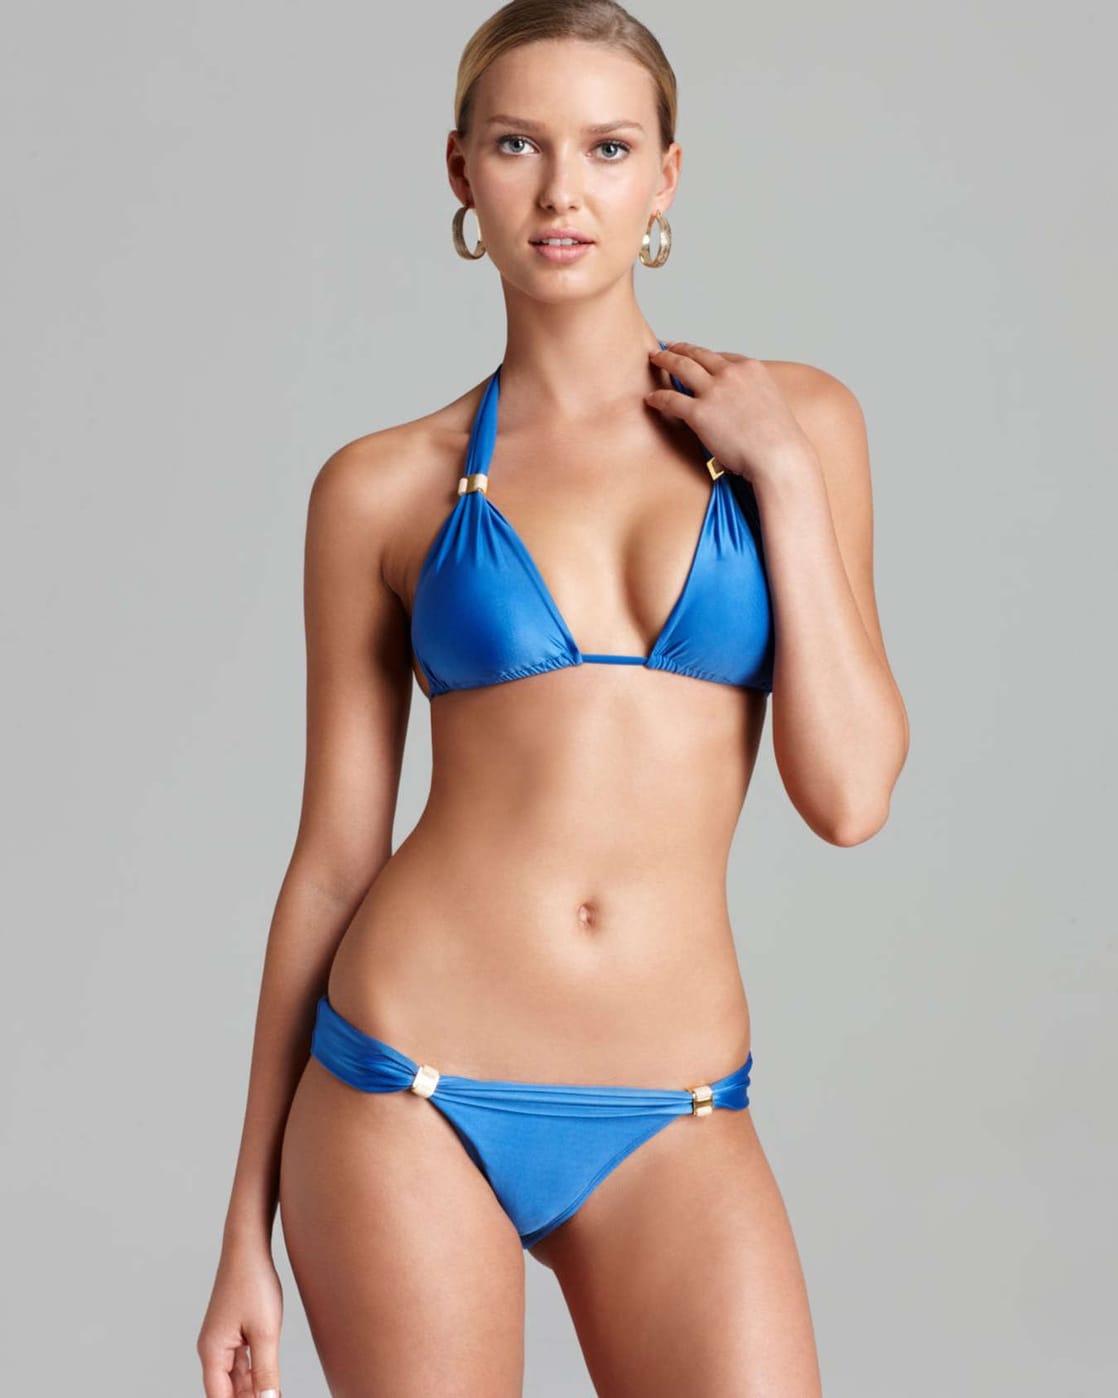 Bikini Adriana Cernanova nude (53 photos), Topless, Cleavage, Boobs, panties 2020